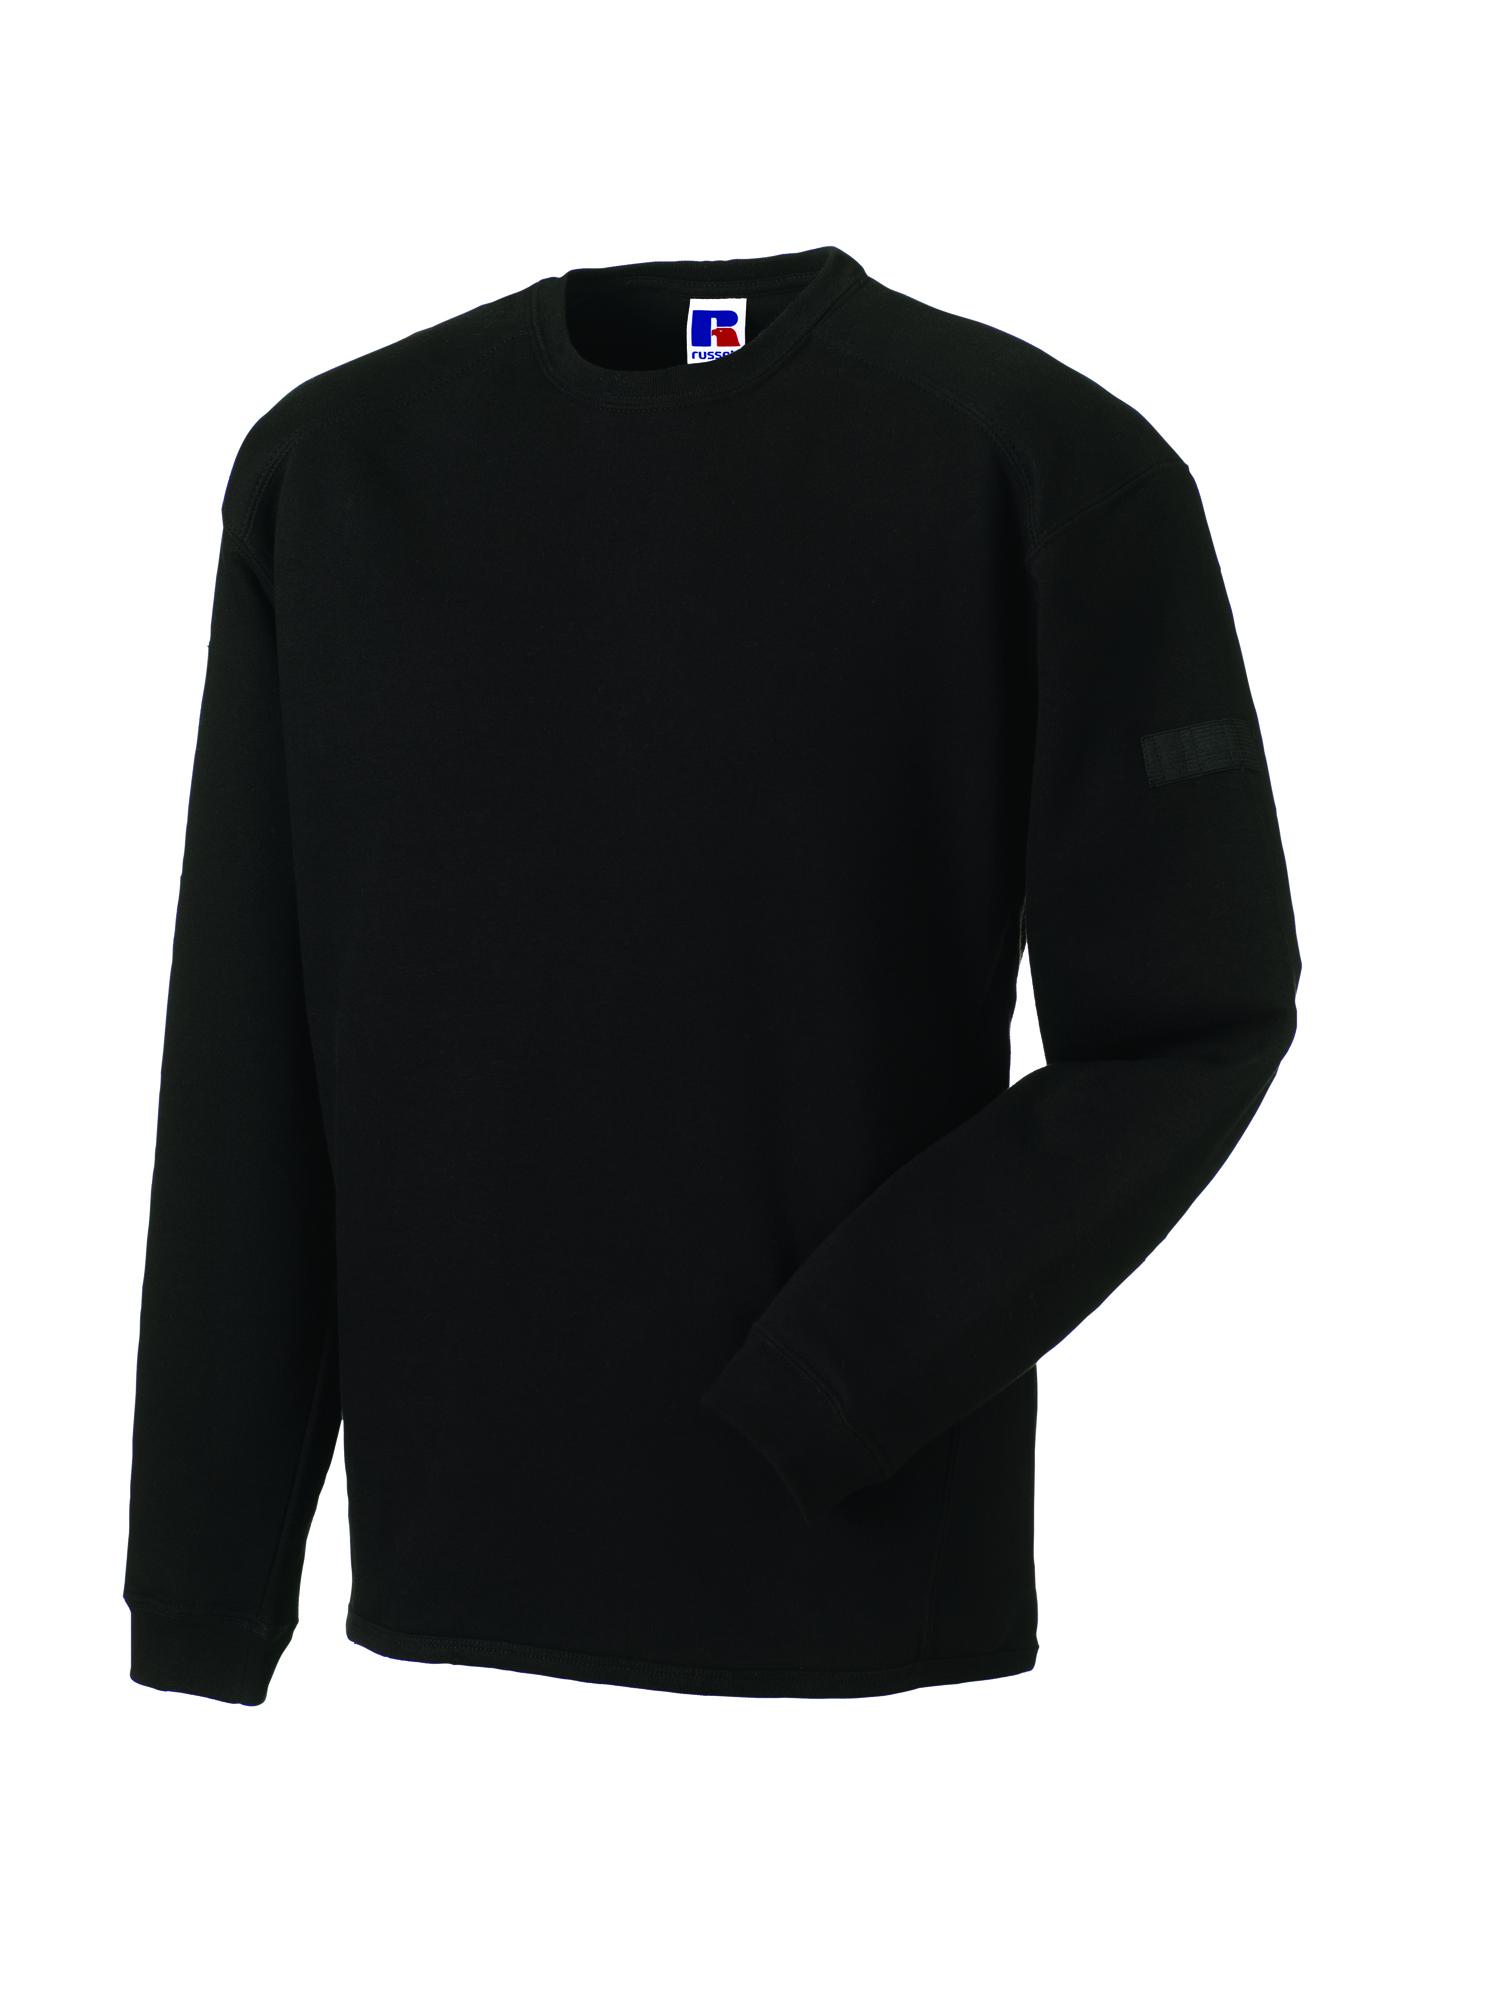 Heavy Duty Crewneck Sweatshirt - Black - L